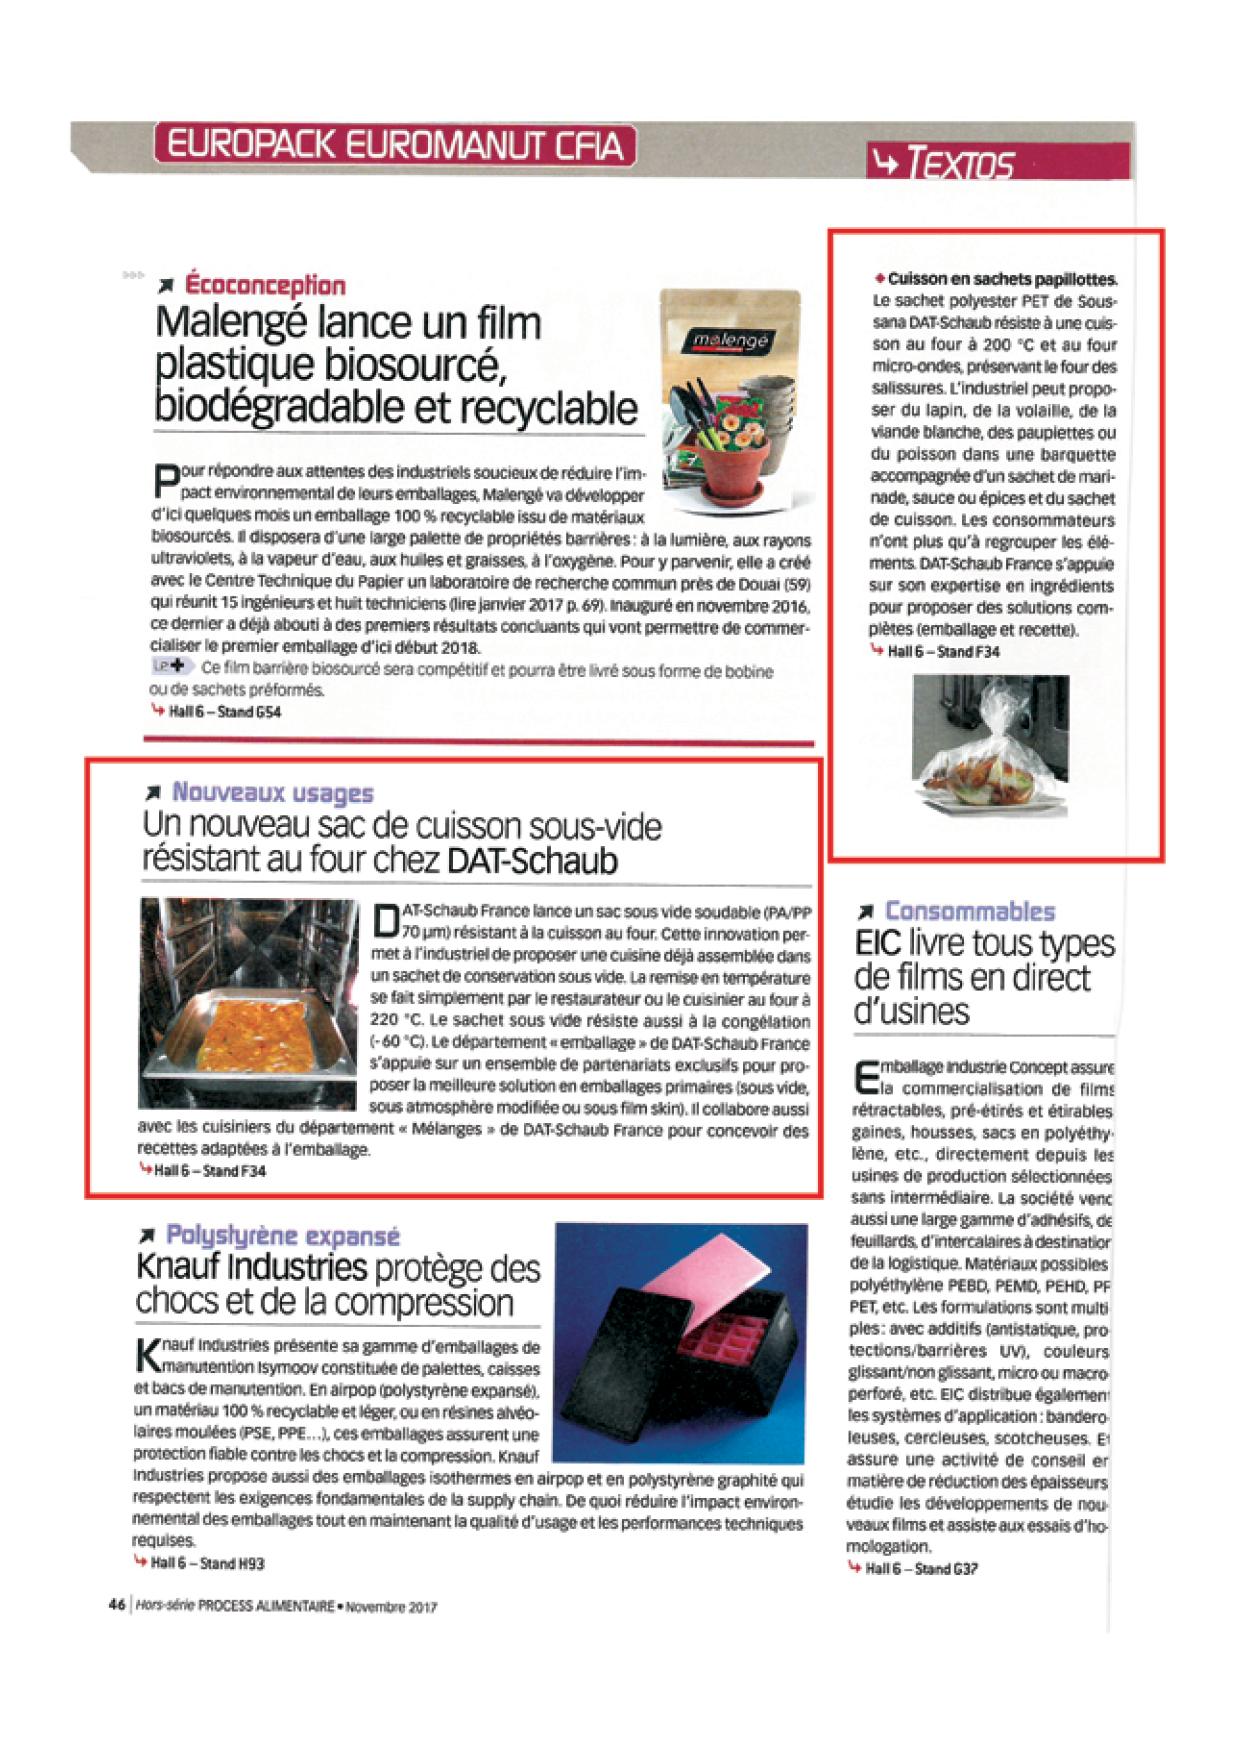 PROCESS HORS SERIE EUROPACK EUROMANUT - Novembre 2017 - 3 articles produits emballages2